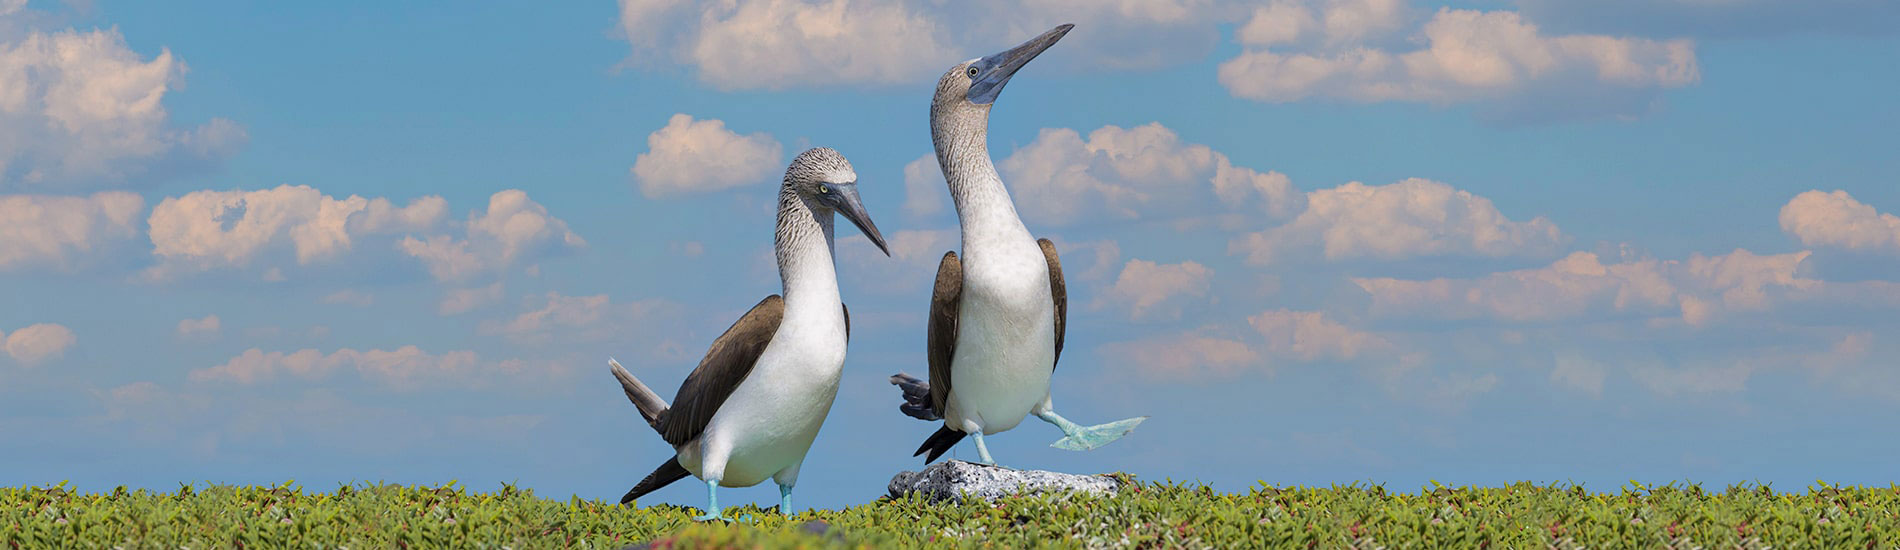 藍腳鰹鳥(Blue Footed Booby)